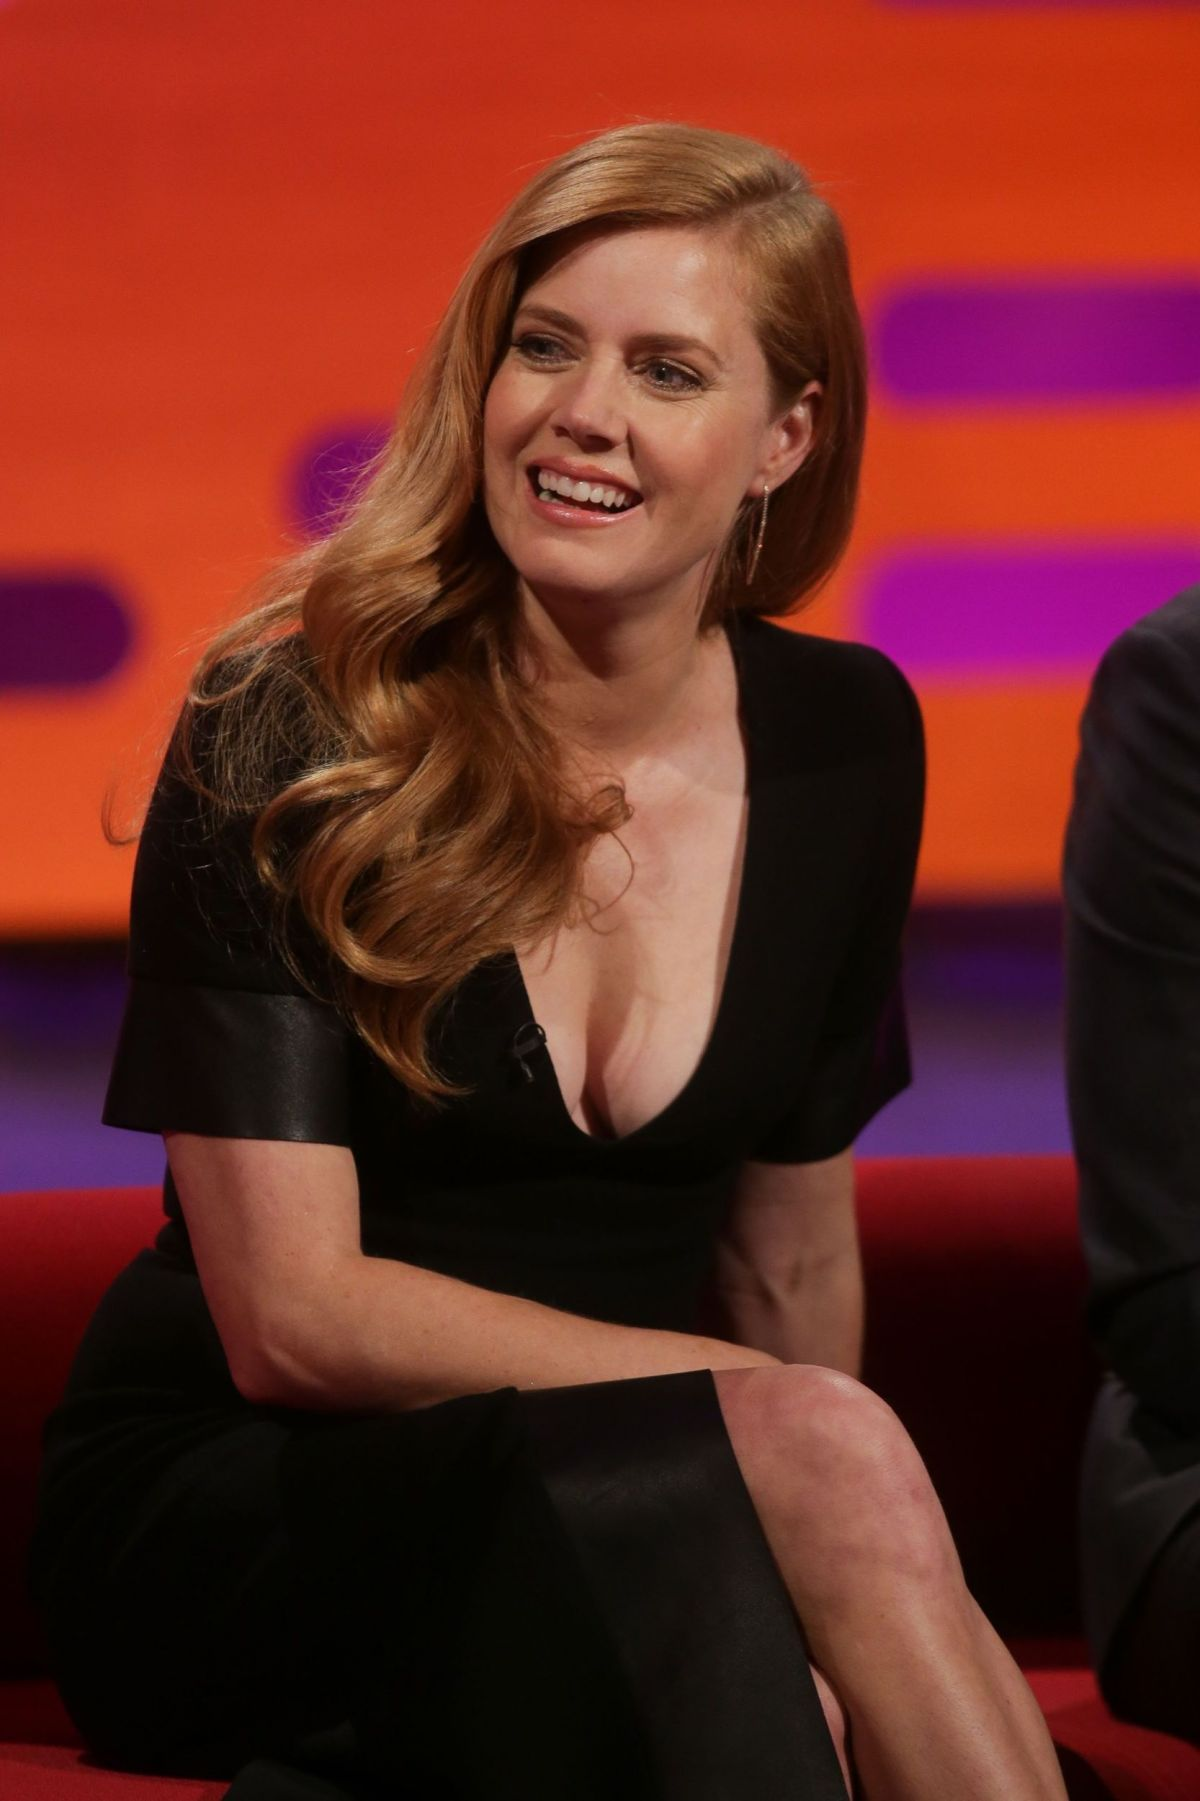 Amy Adams Graham Norton Show 2016 Actresses Pinterest